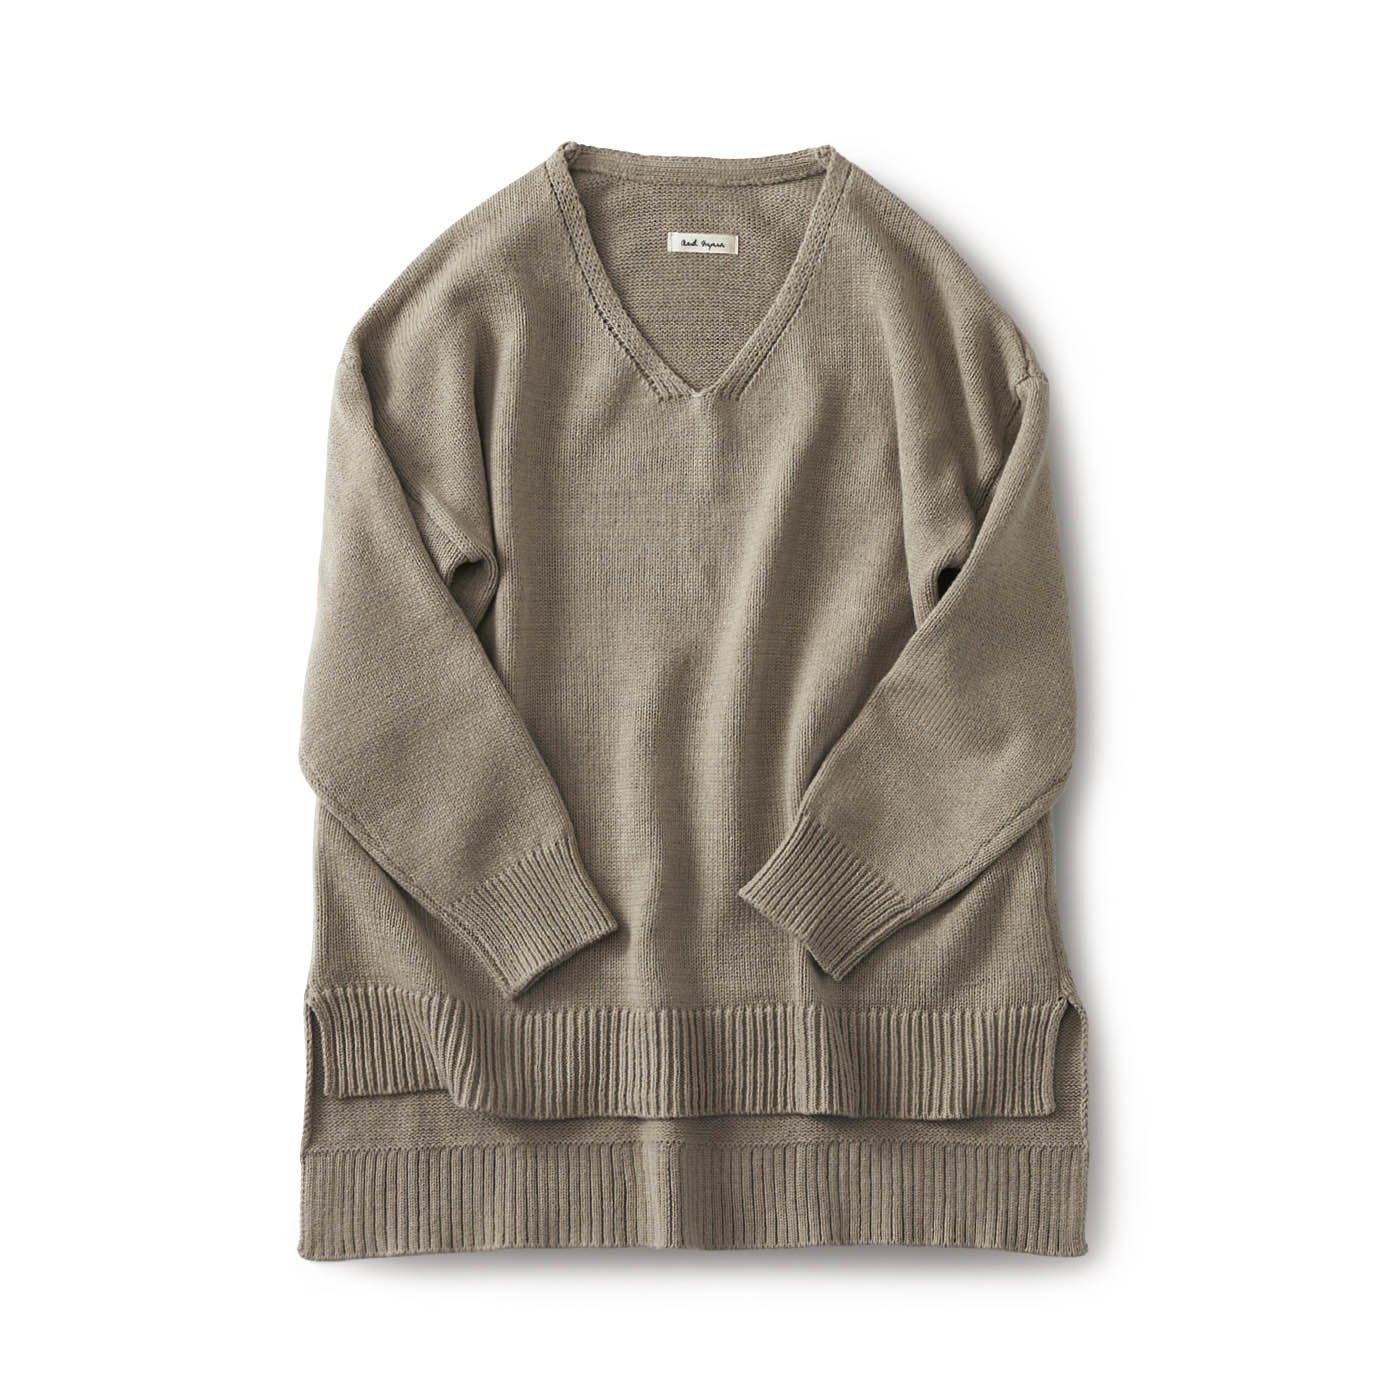 and myera Vネックのセーター